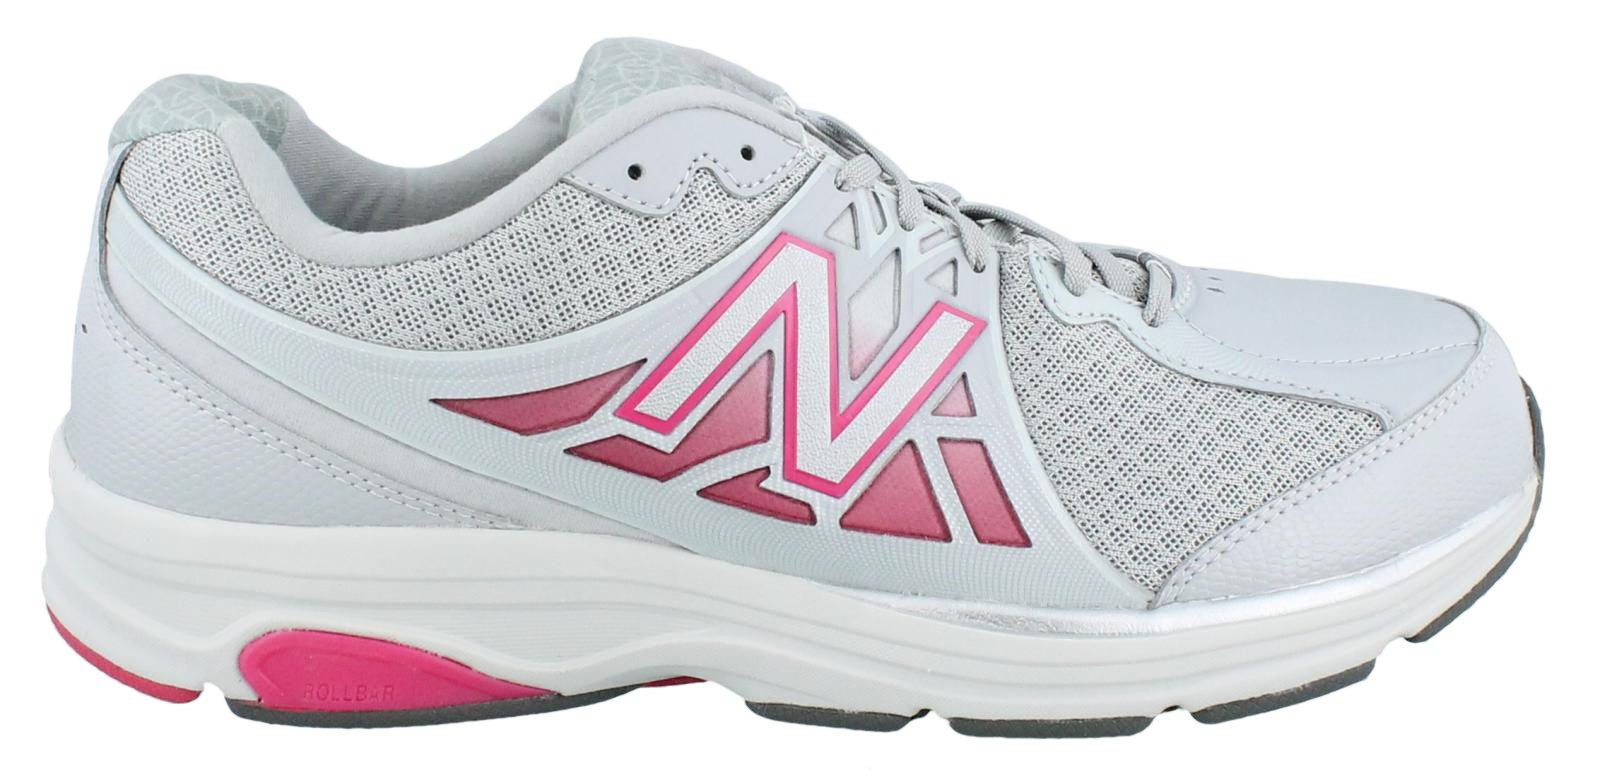 New Balance Women's WW847V2 Walking Shoe,Grey,7.5 D US by New Balance (Image #1)